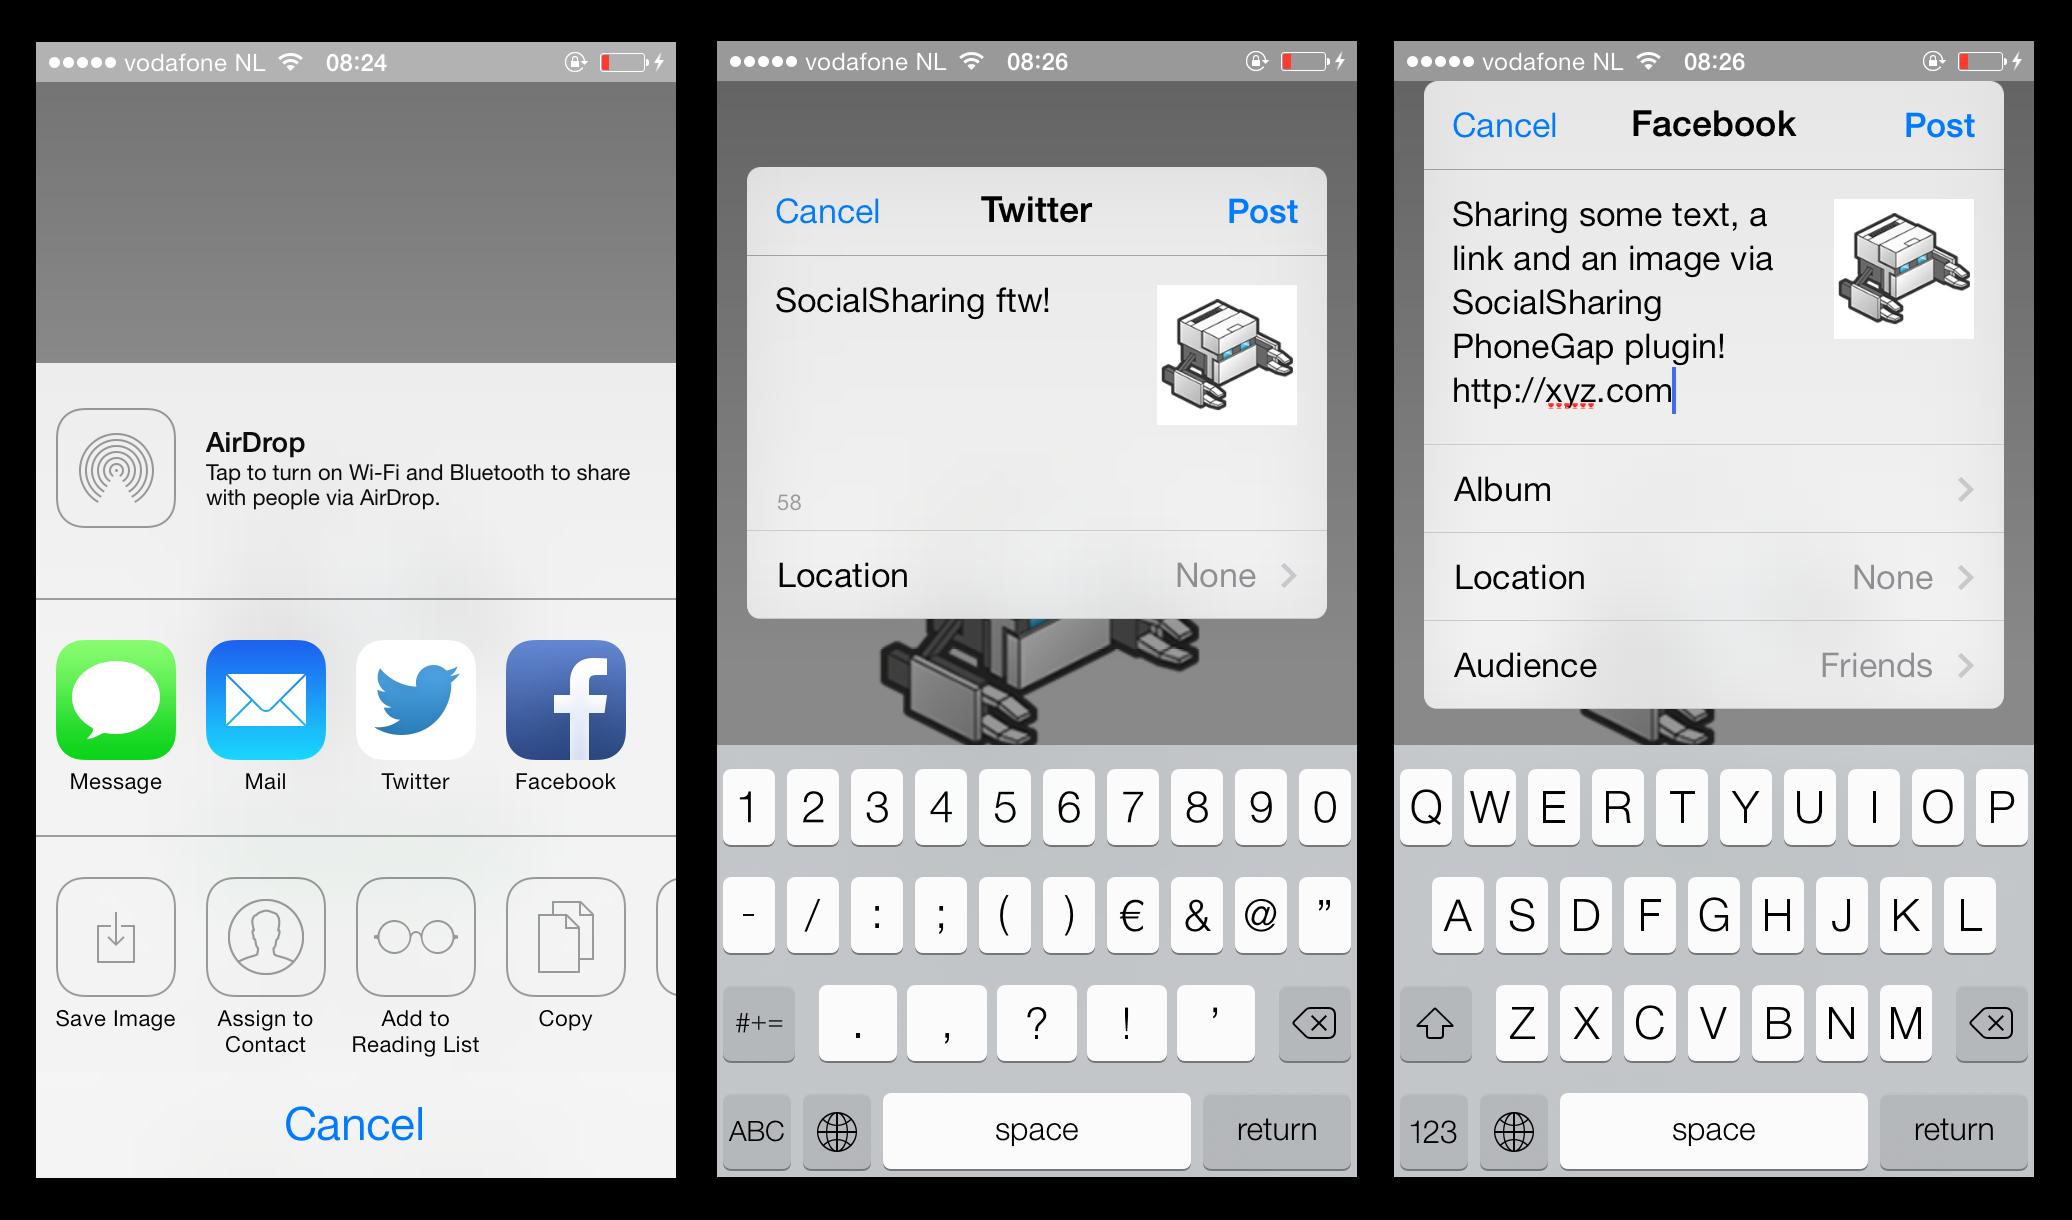 plugins/cordova-plugin-x-socialsharing/screenshots/screenshot-ios7-share.png